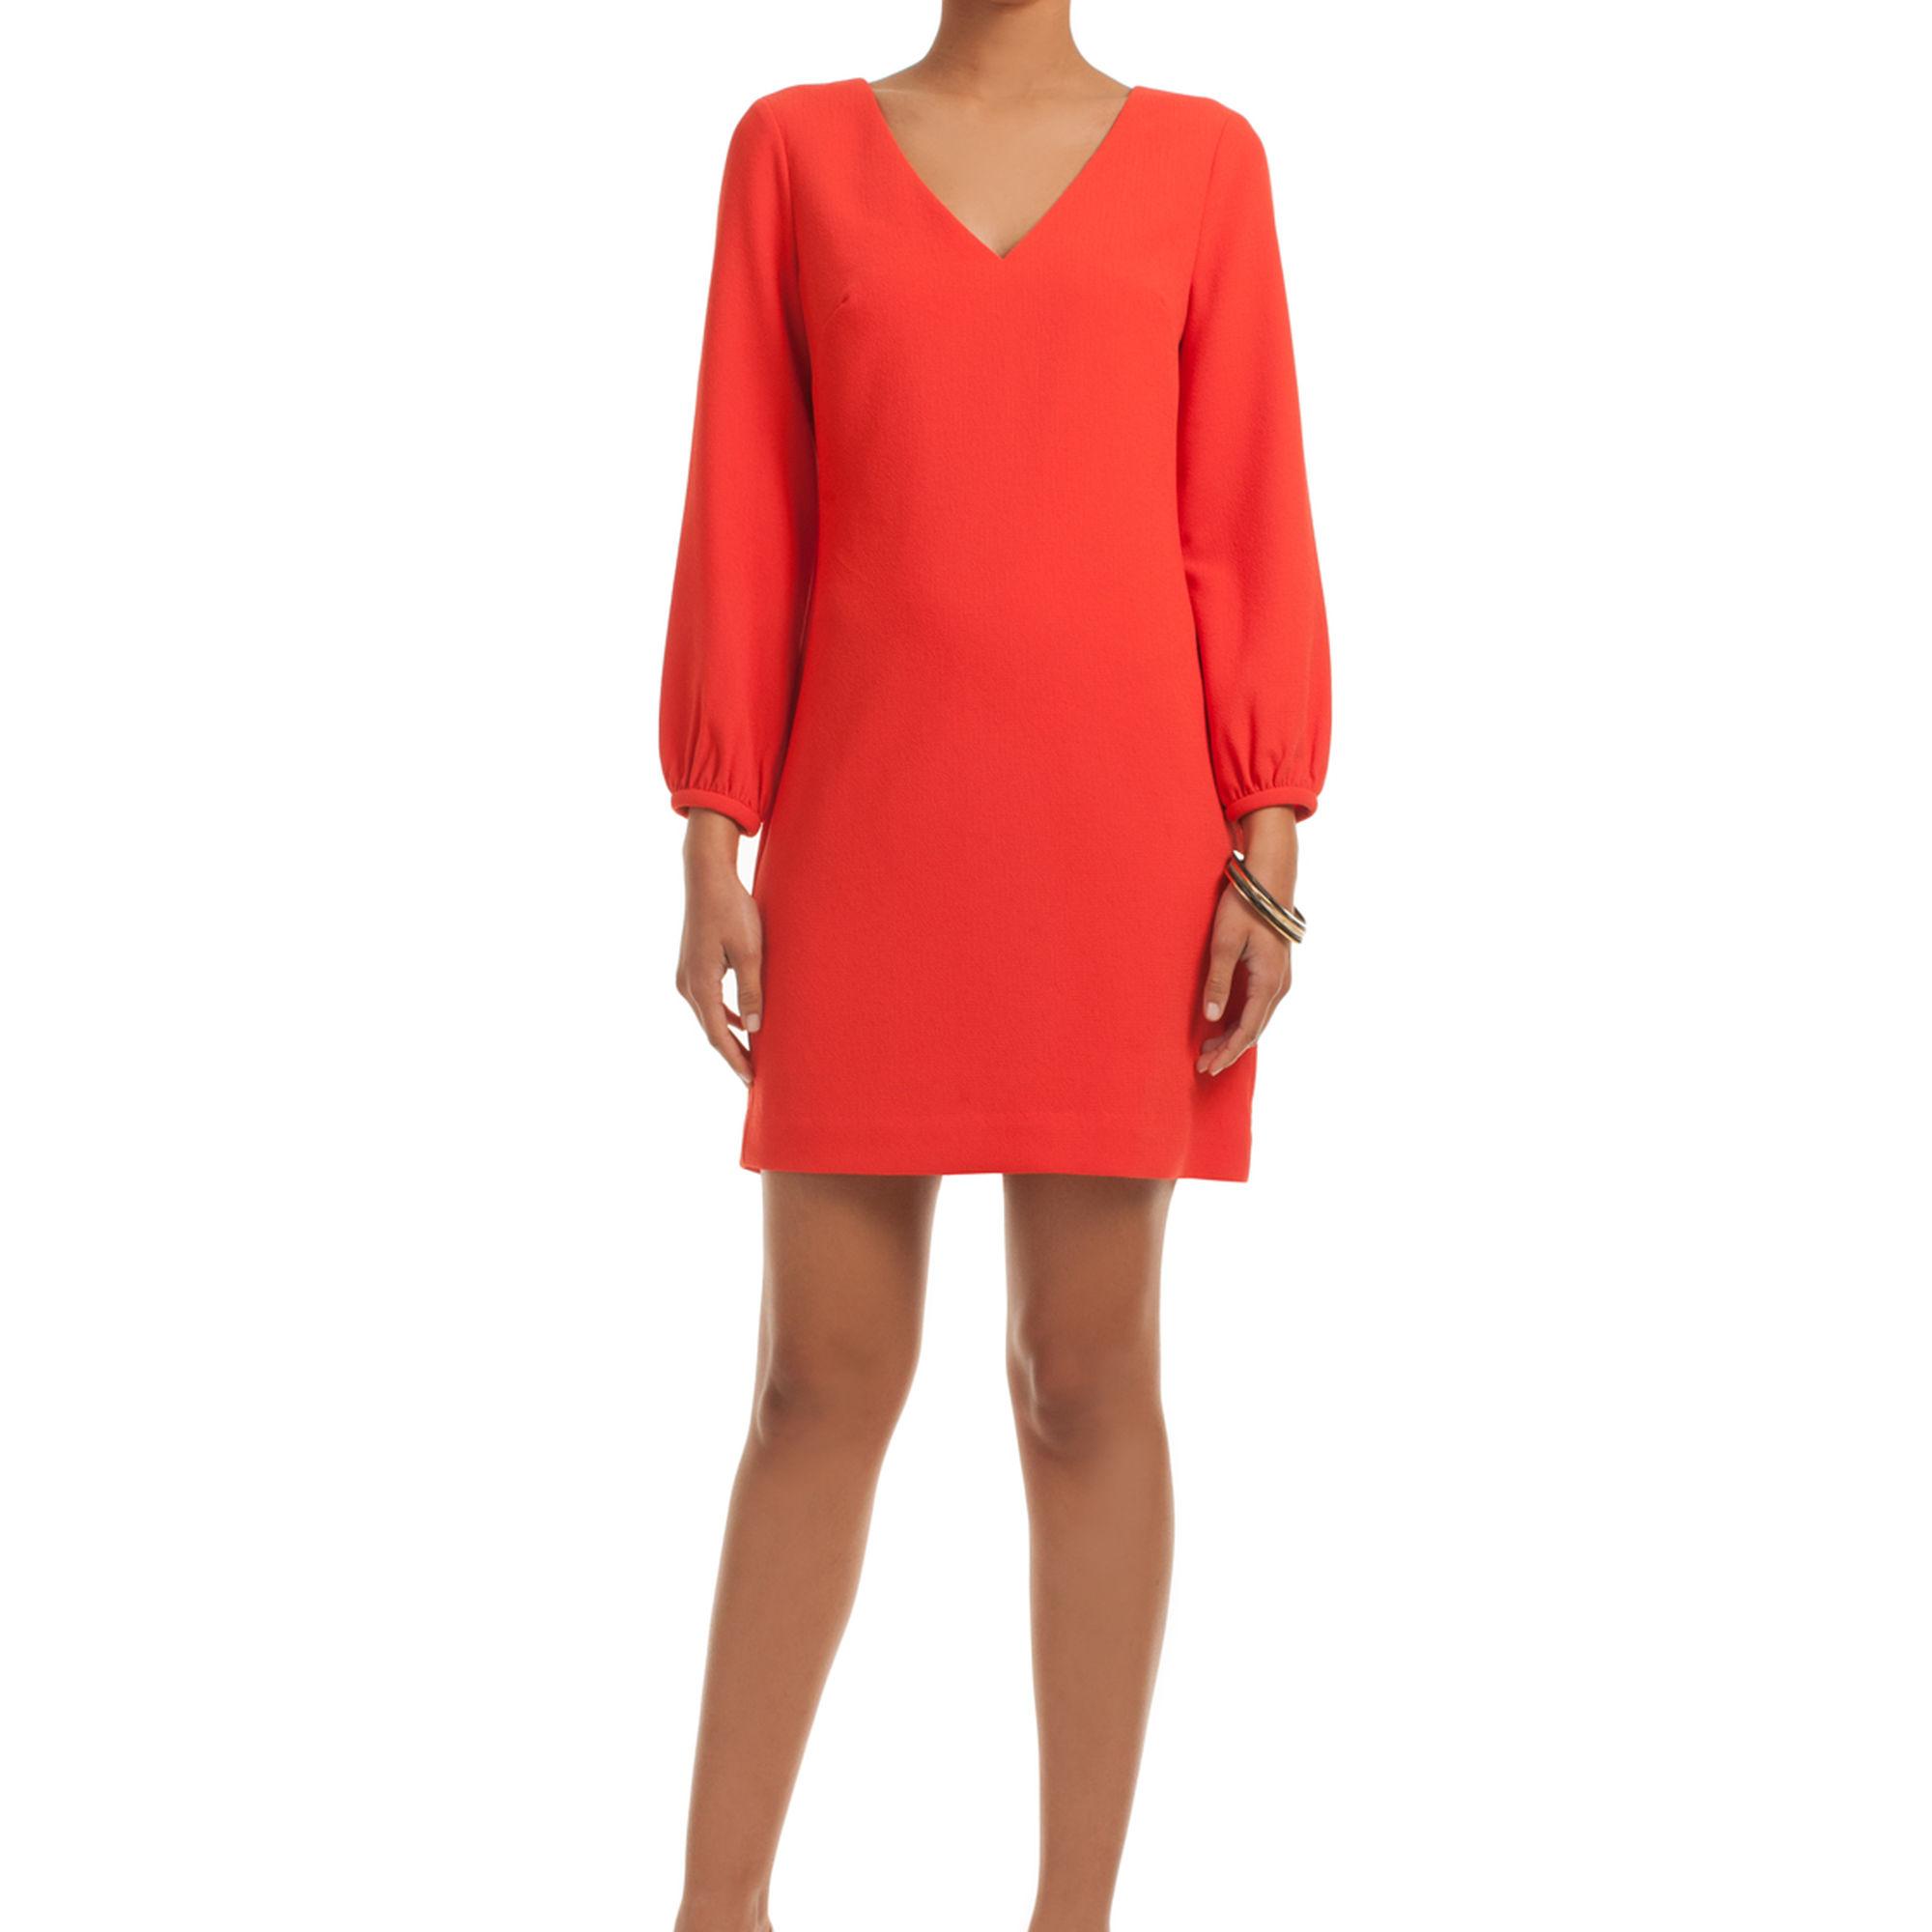 "<a href=""https://www.trinaturk.com/belleza-dress/TD171003.html"">Trina Turk Belleza Dress</a>, $258"